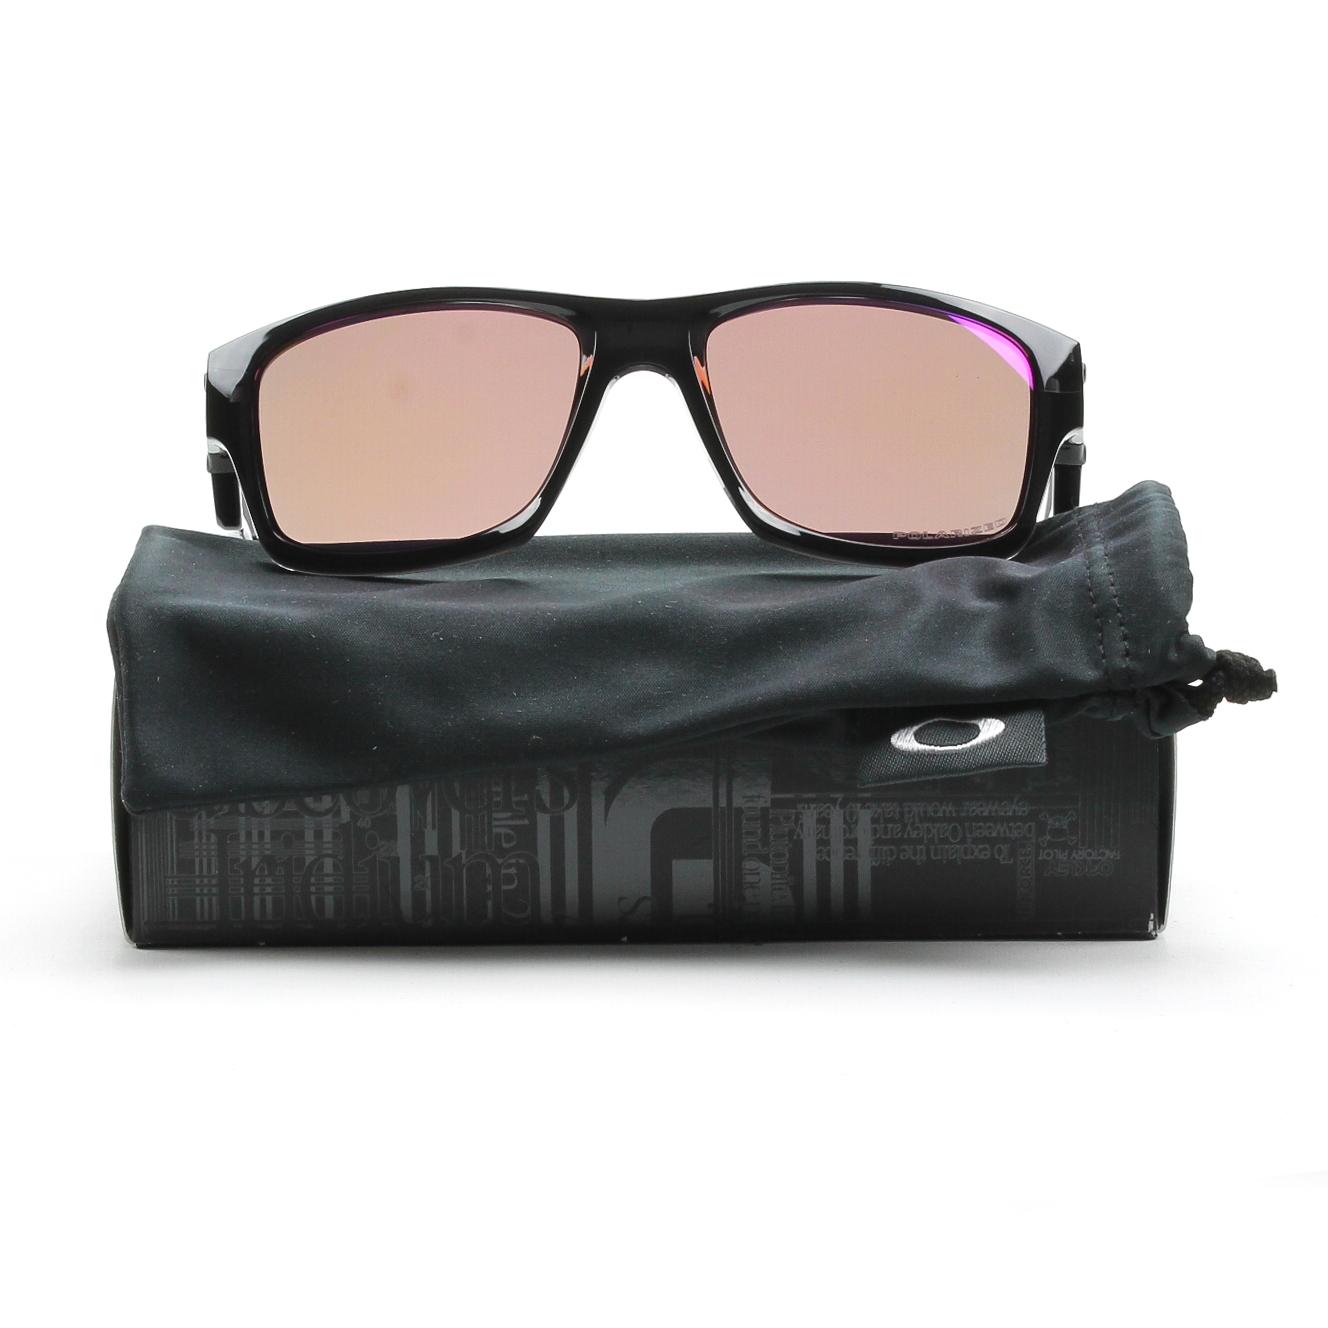 oakley jupiter squared sunglasses  oakley jupiter squared